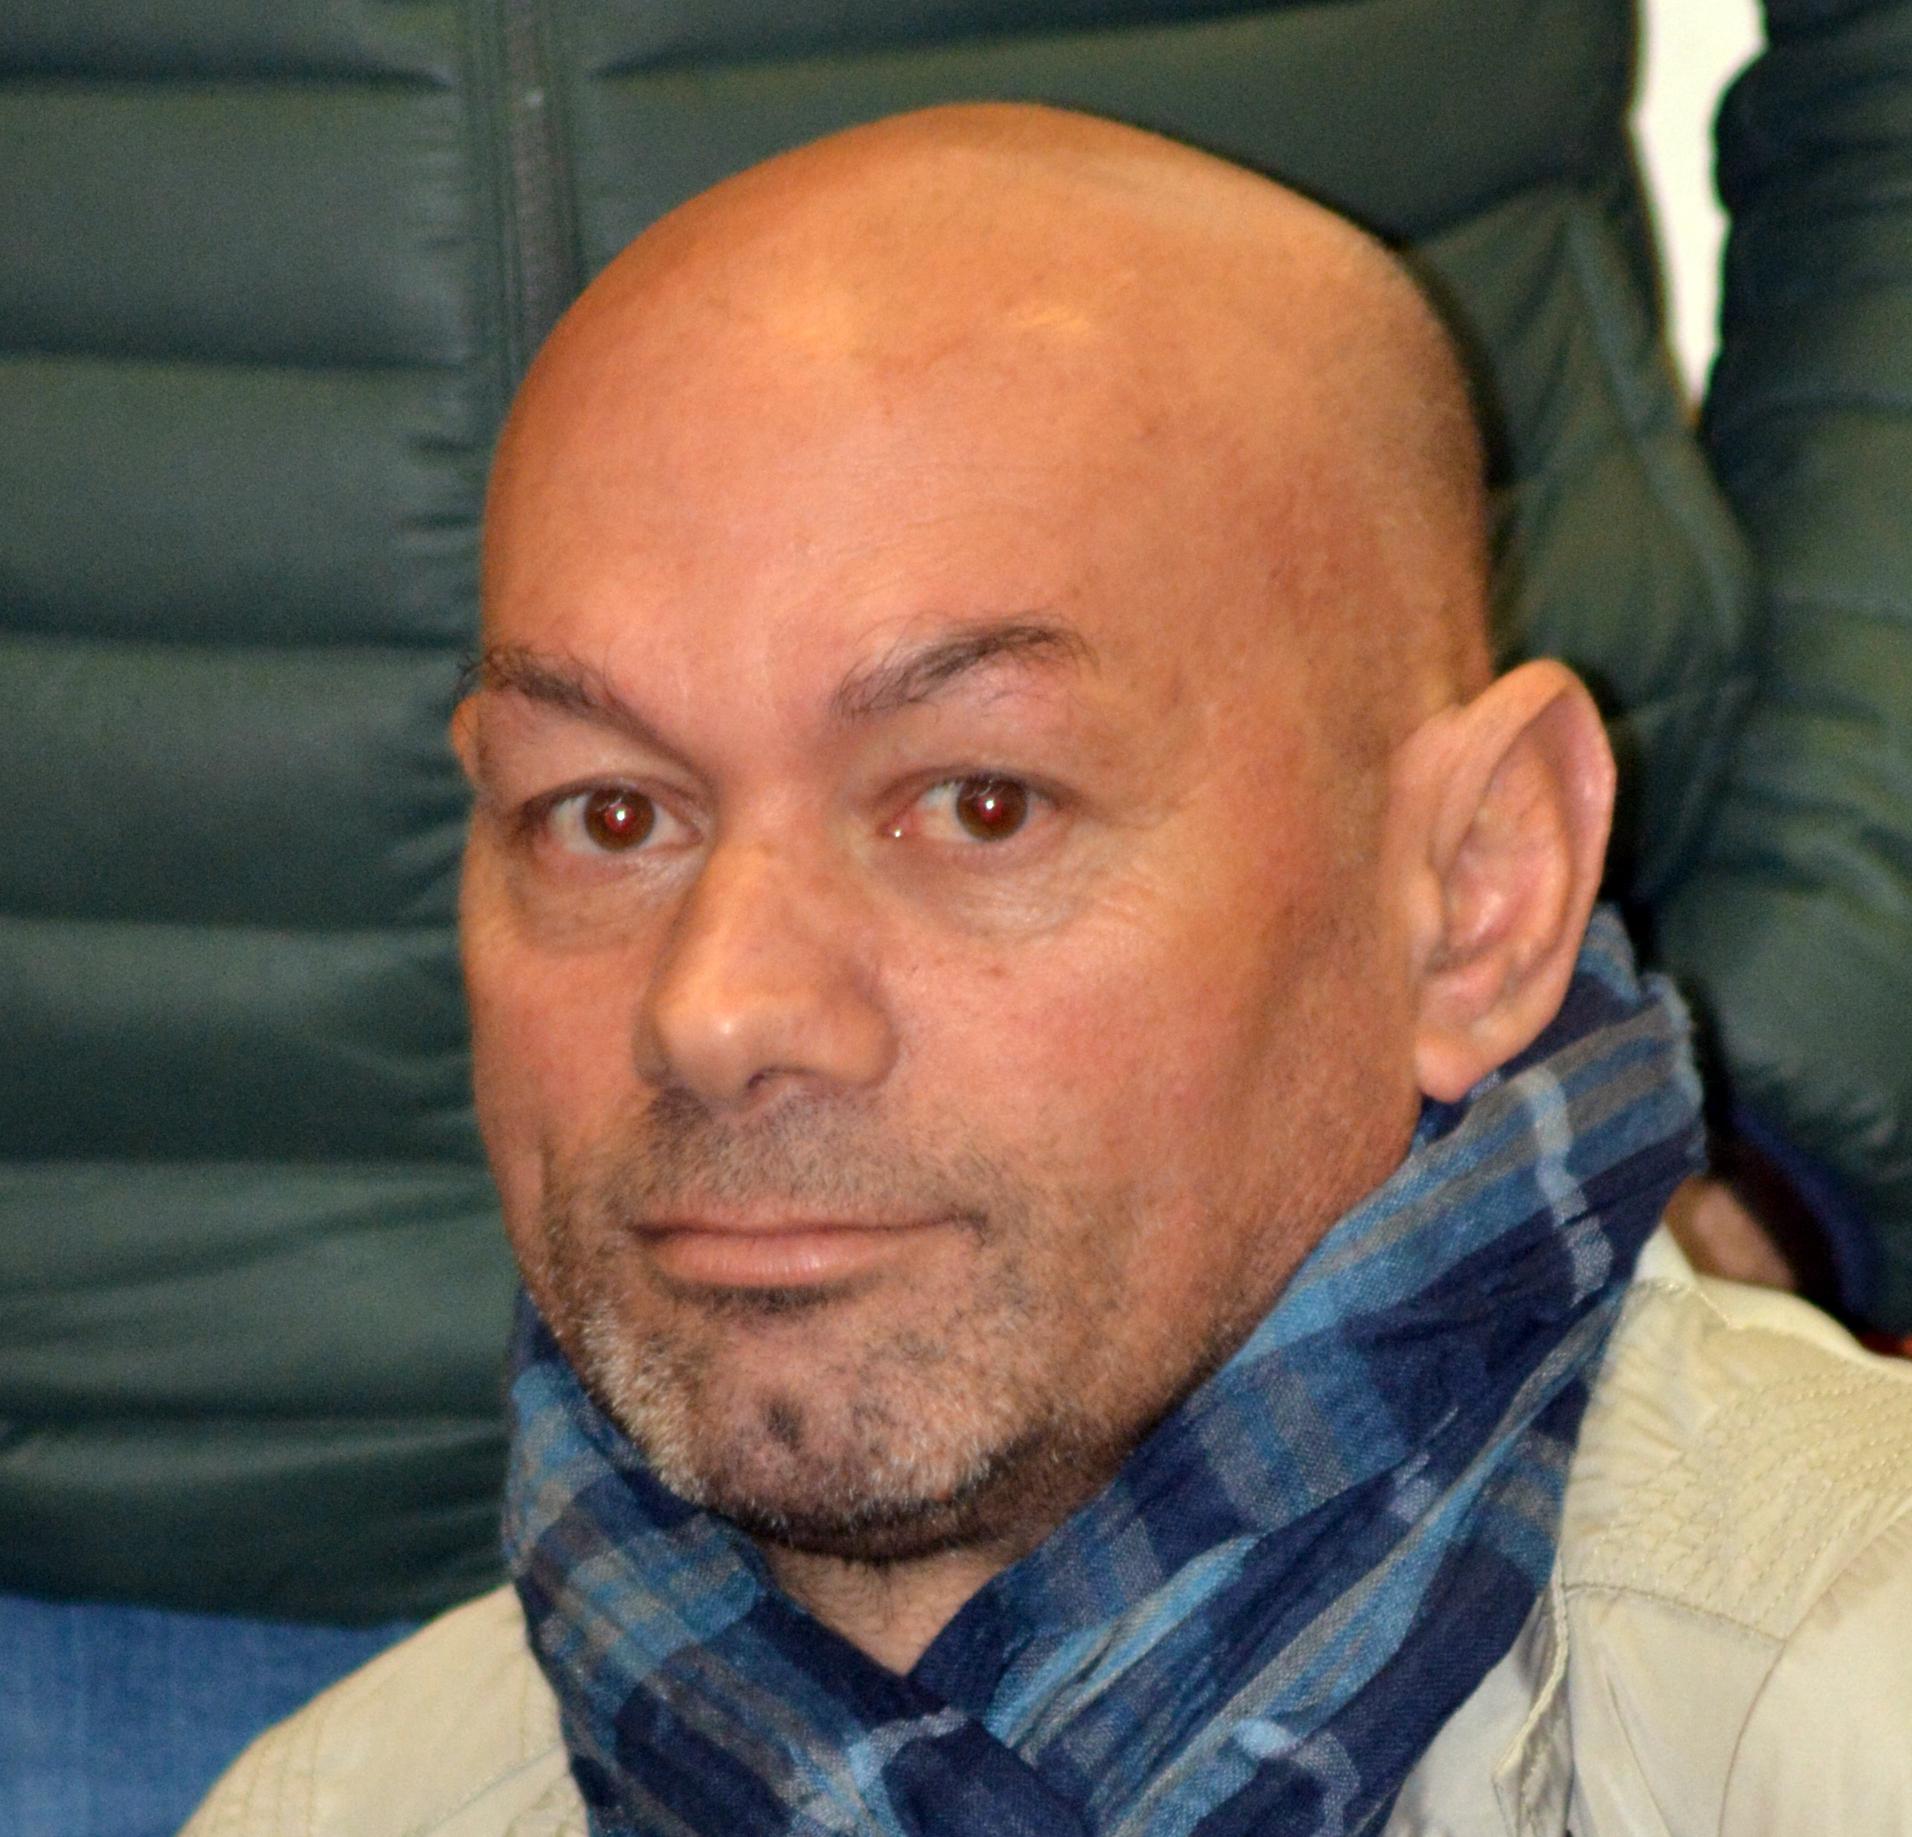 Pietro Sergi